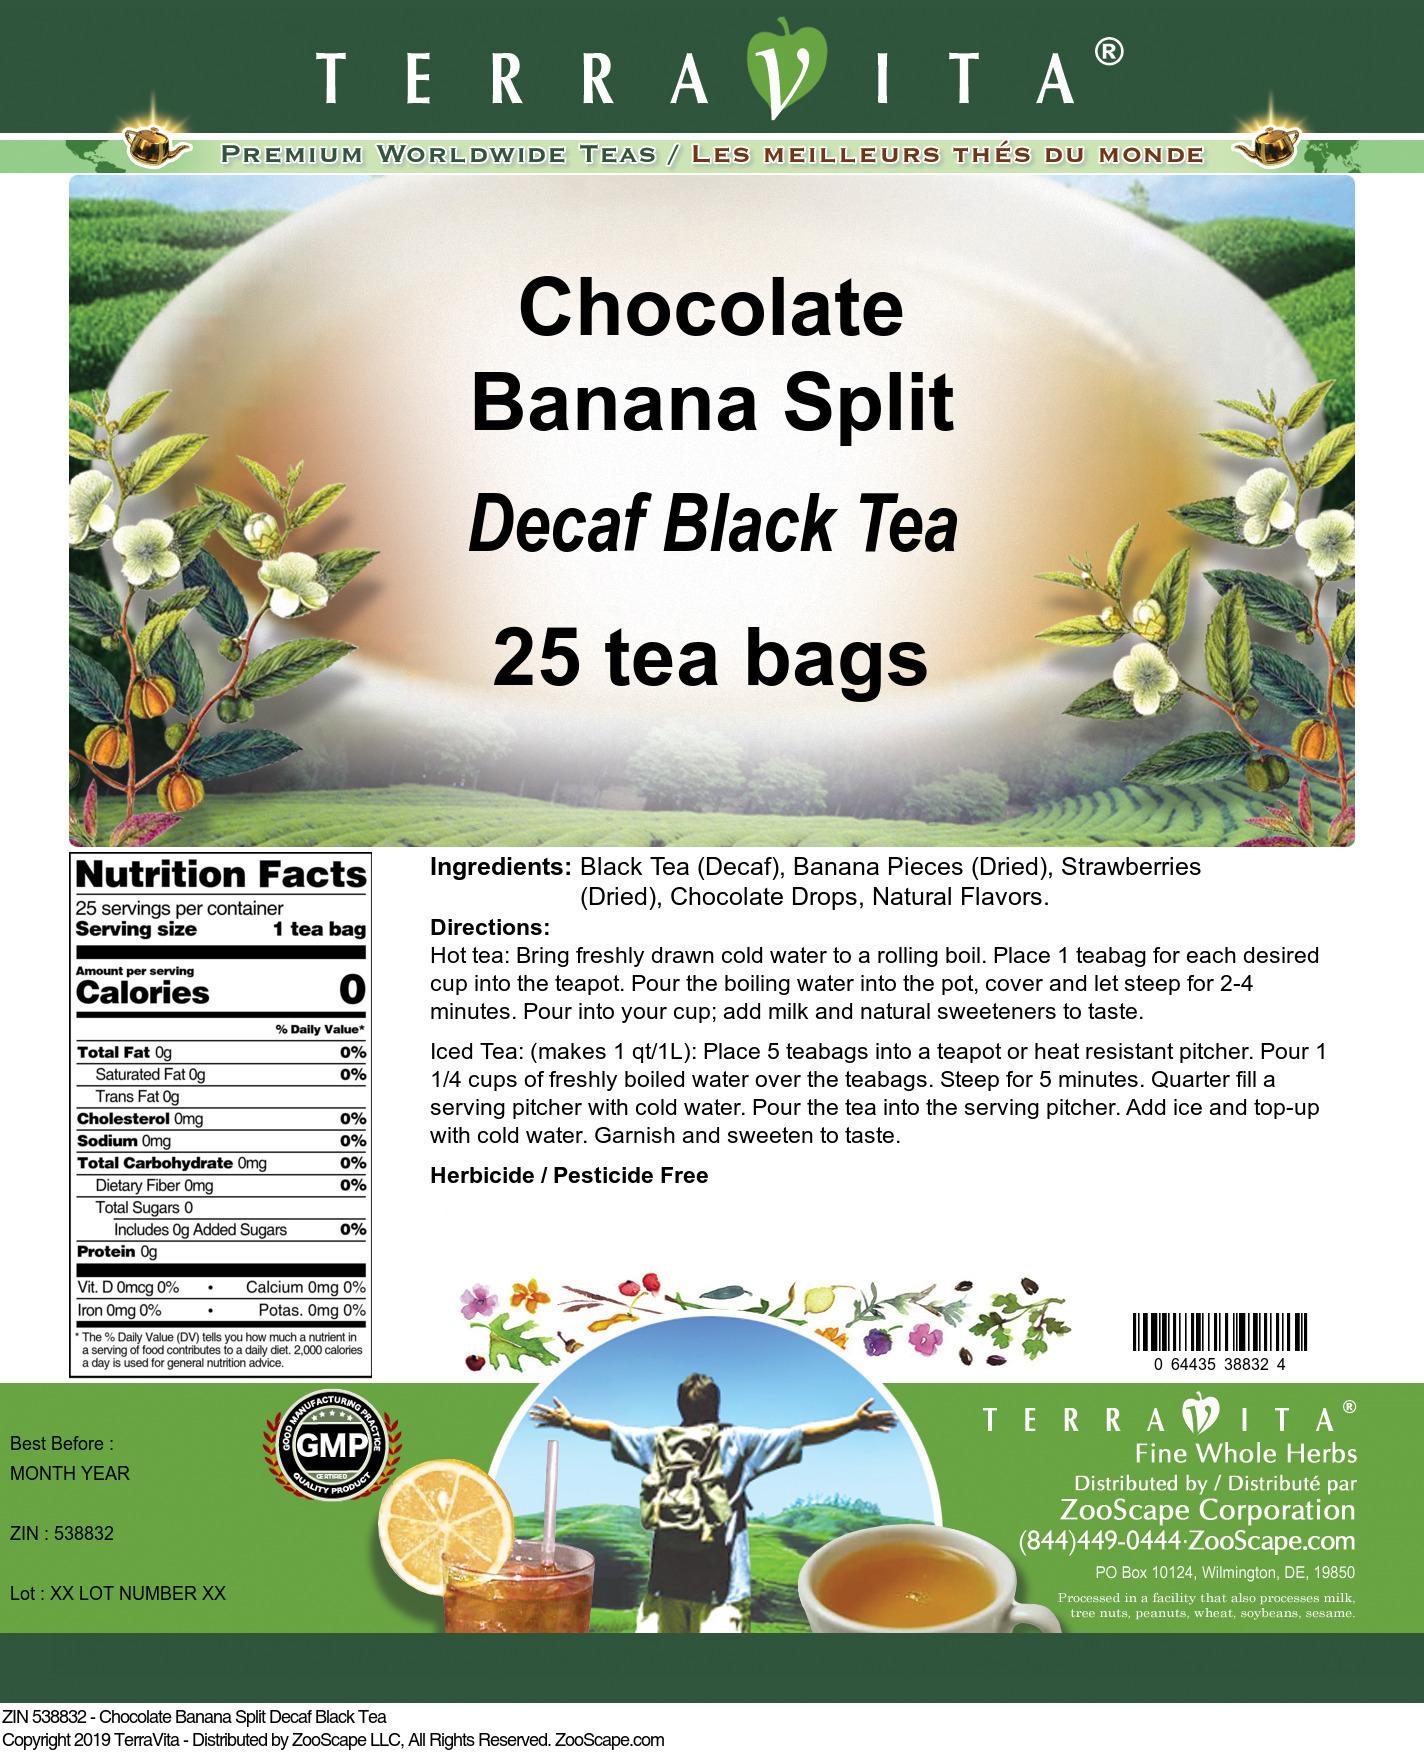 Chocolate Banana Split Decaf Black Tea